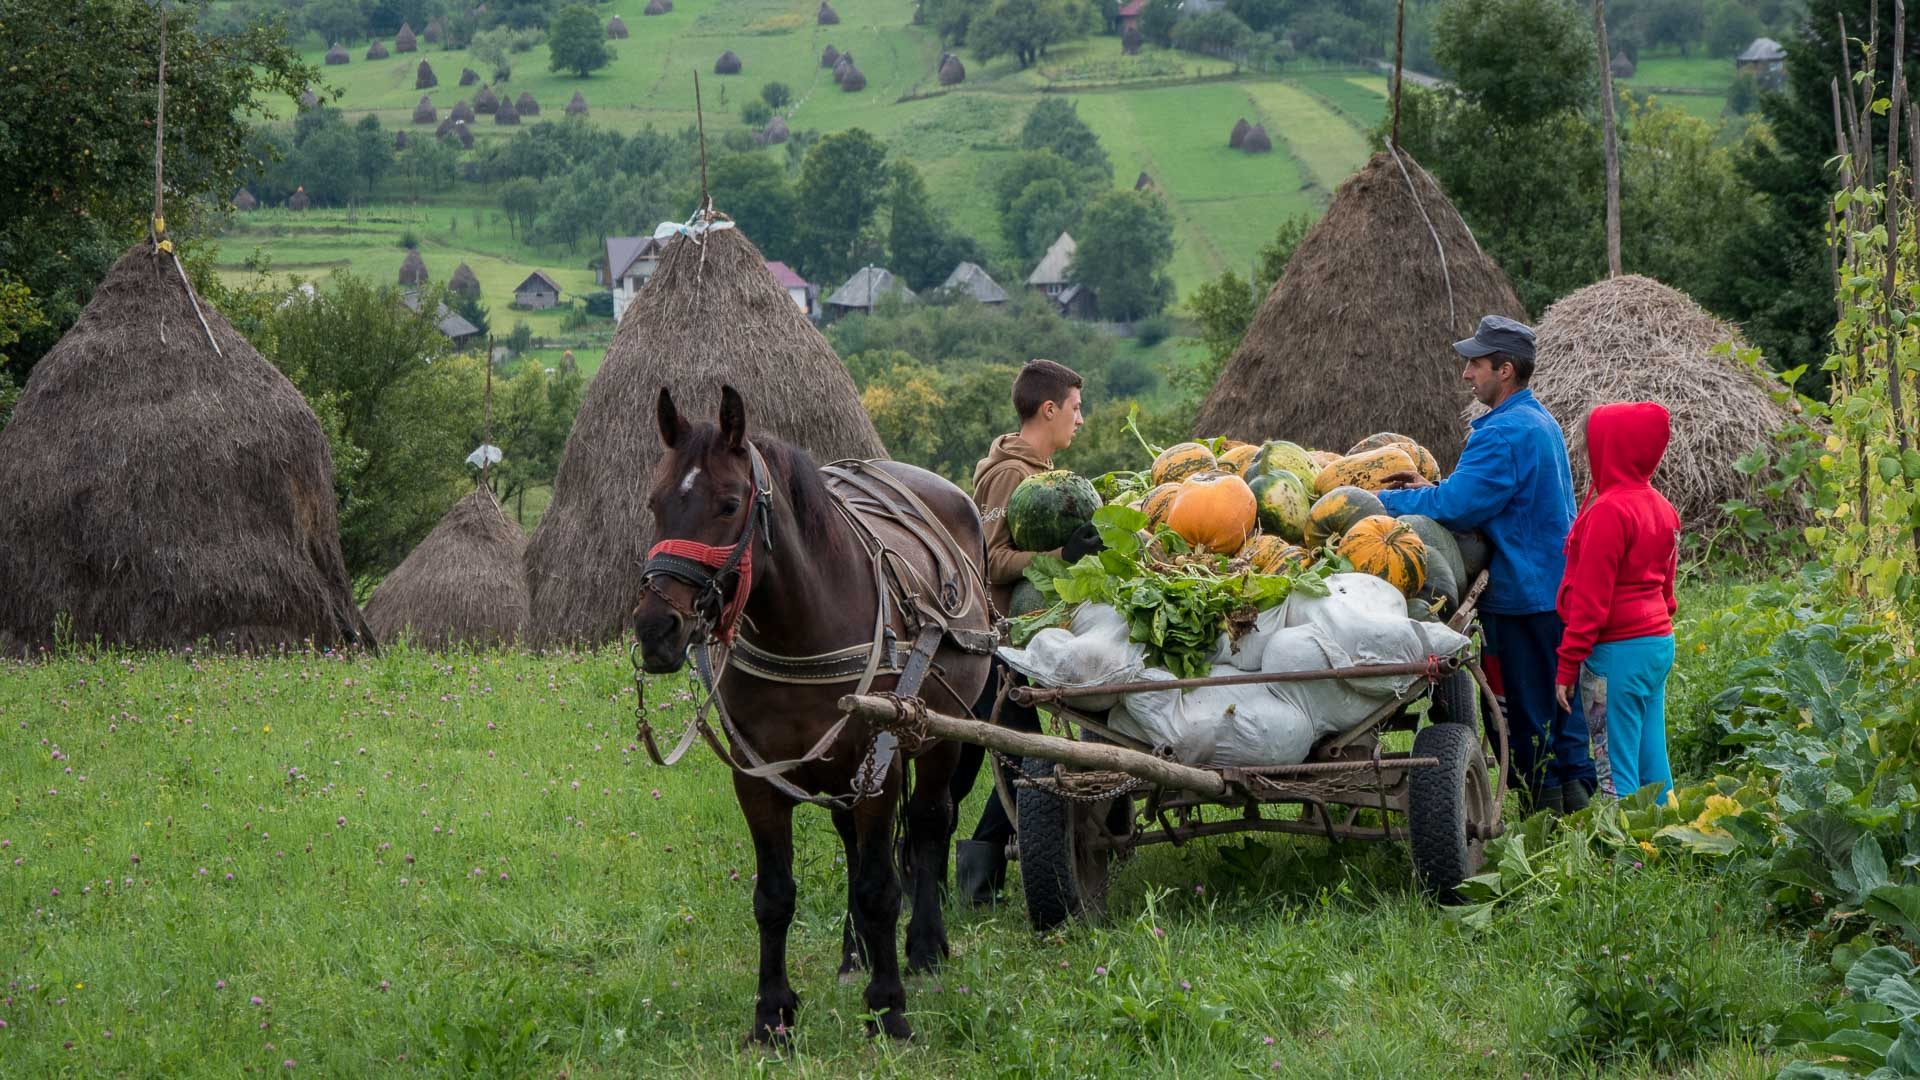 Maramures - traditional life